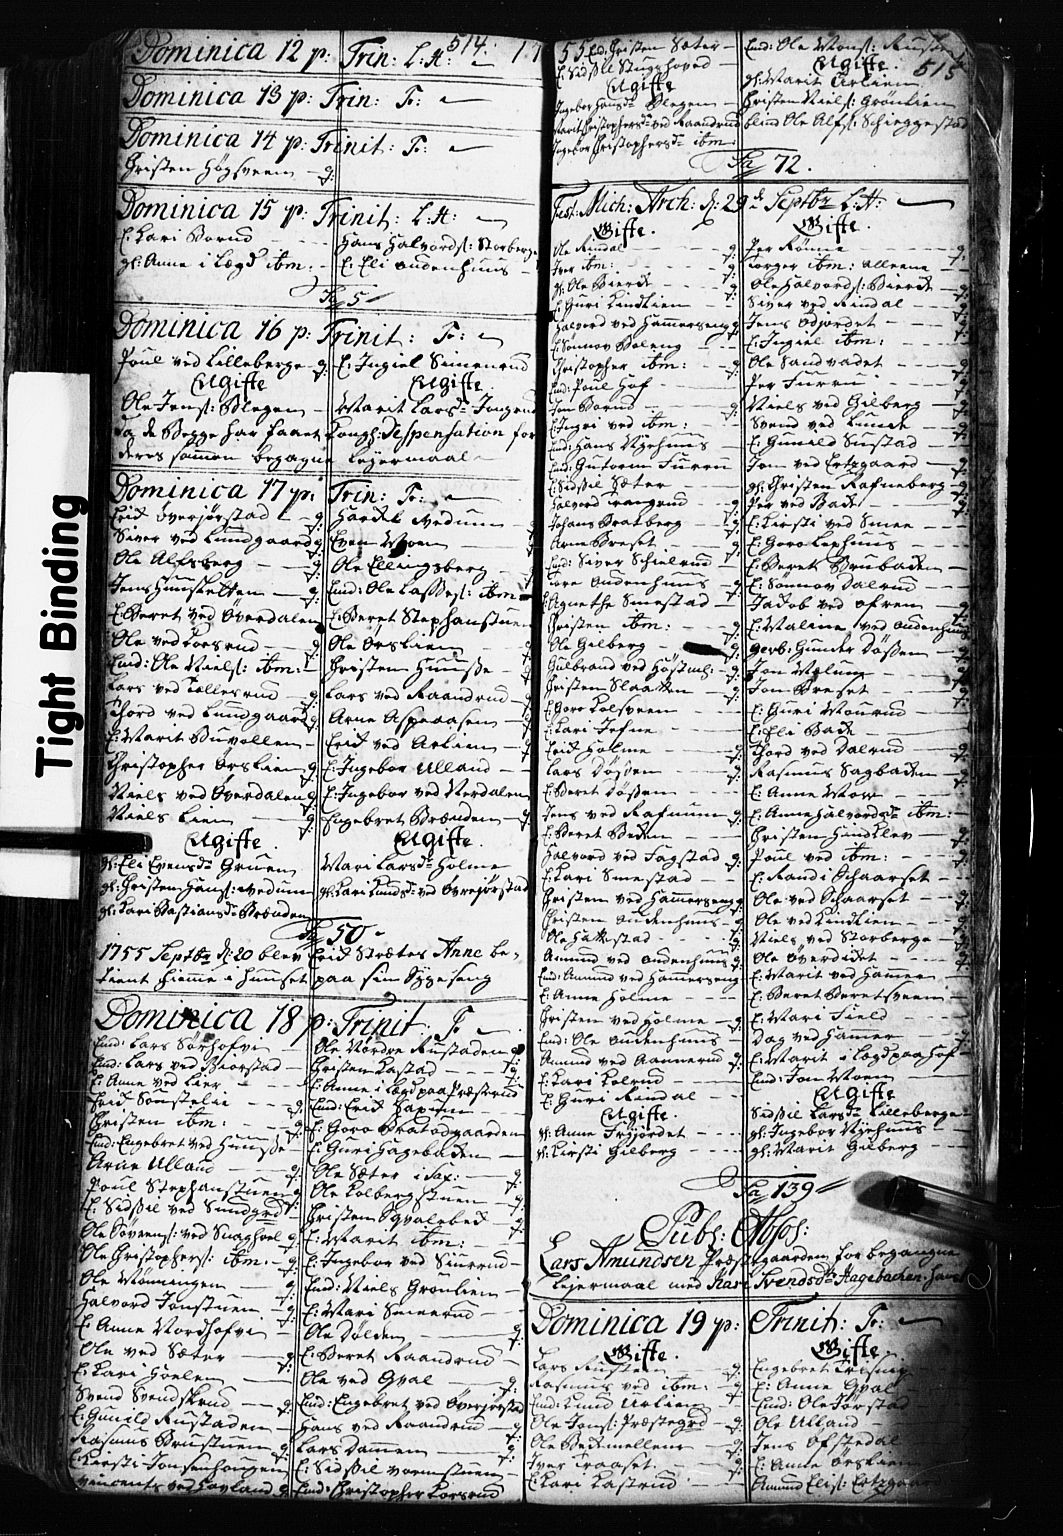 SAH, Fåberg prestekontor, Klokkerbok nr. 2, 1741-1756, s. 514-515